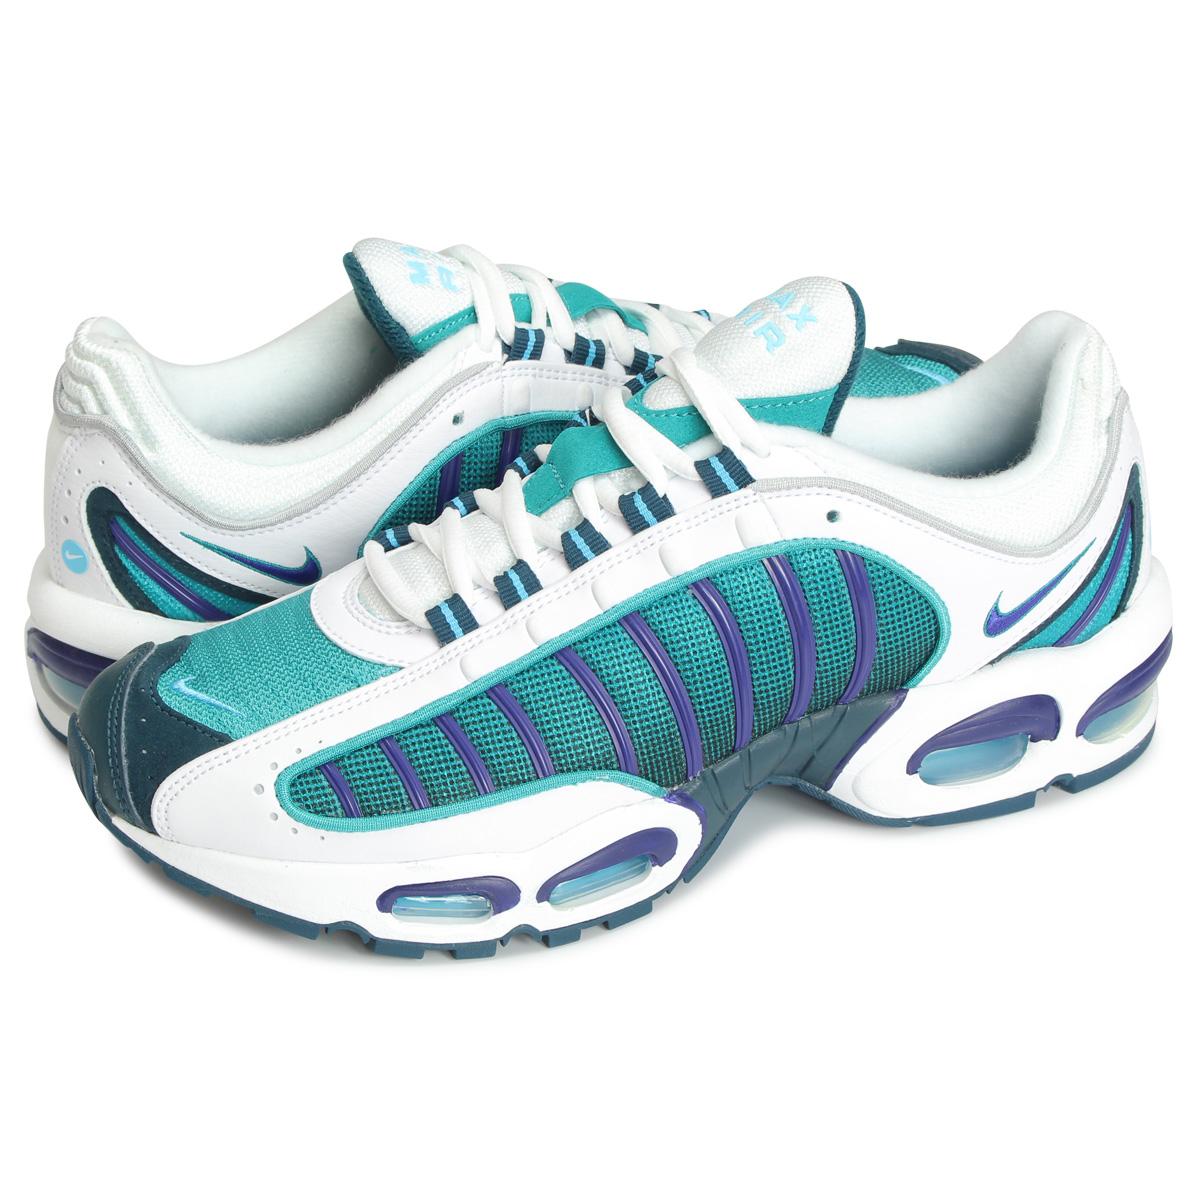 Nike NIKE Air Max tale wind 4 sneakers men AIR MAX TAILWIND 4 white white AQ2567 101 [197]